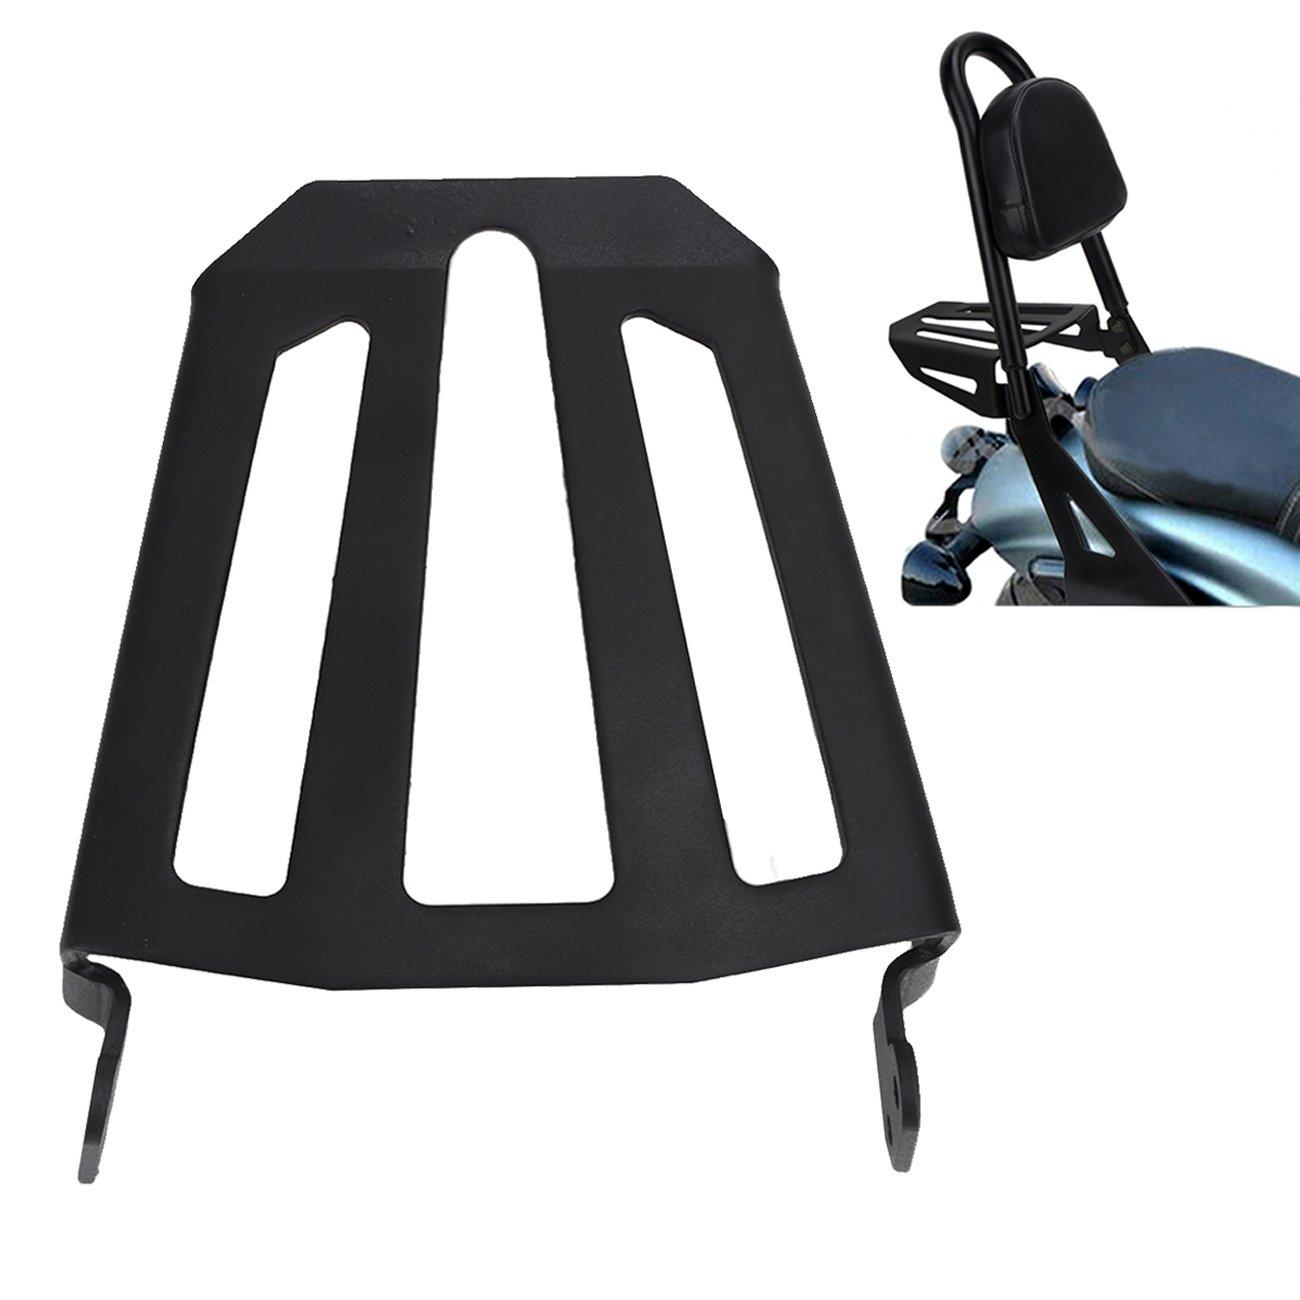 Detachable Passenger Backrest Luggage Rack for Yamaha Bolt Cruiser Black Midnight 2014-2017 BOXWELOVE